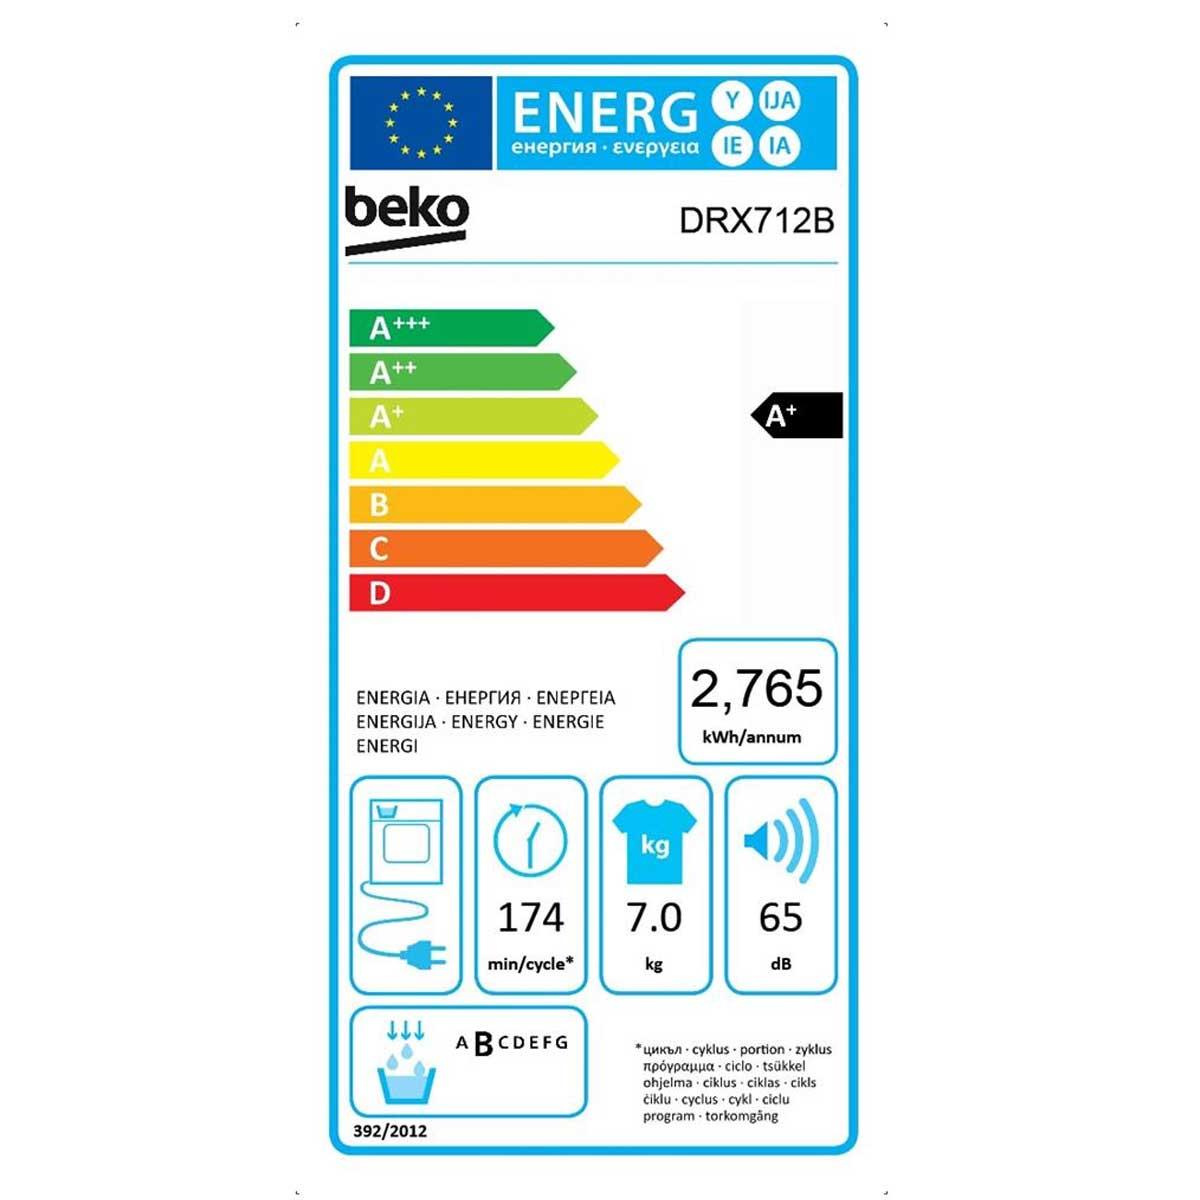 Beko DRX712B etichetta energetica